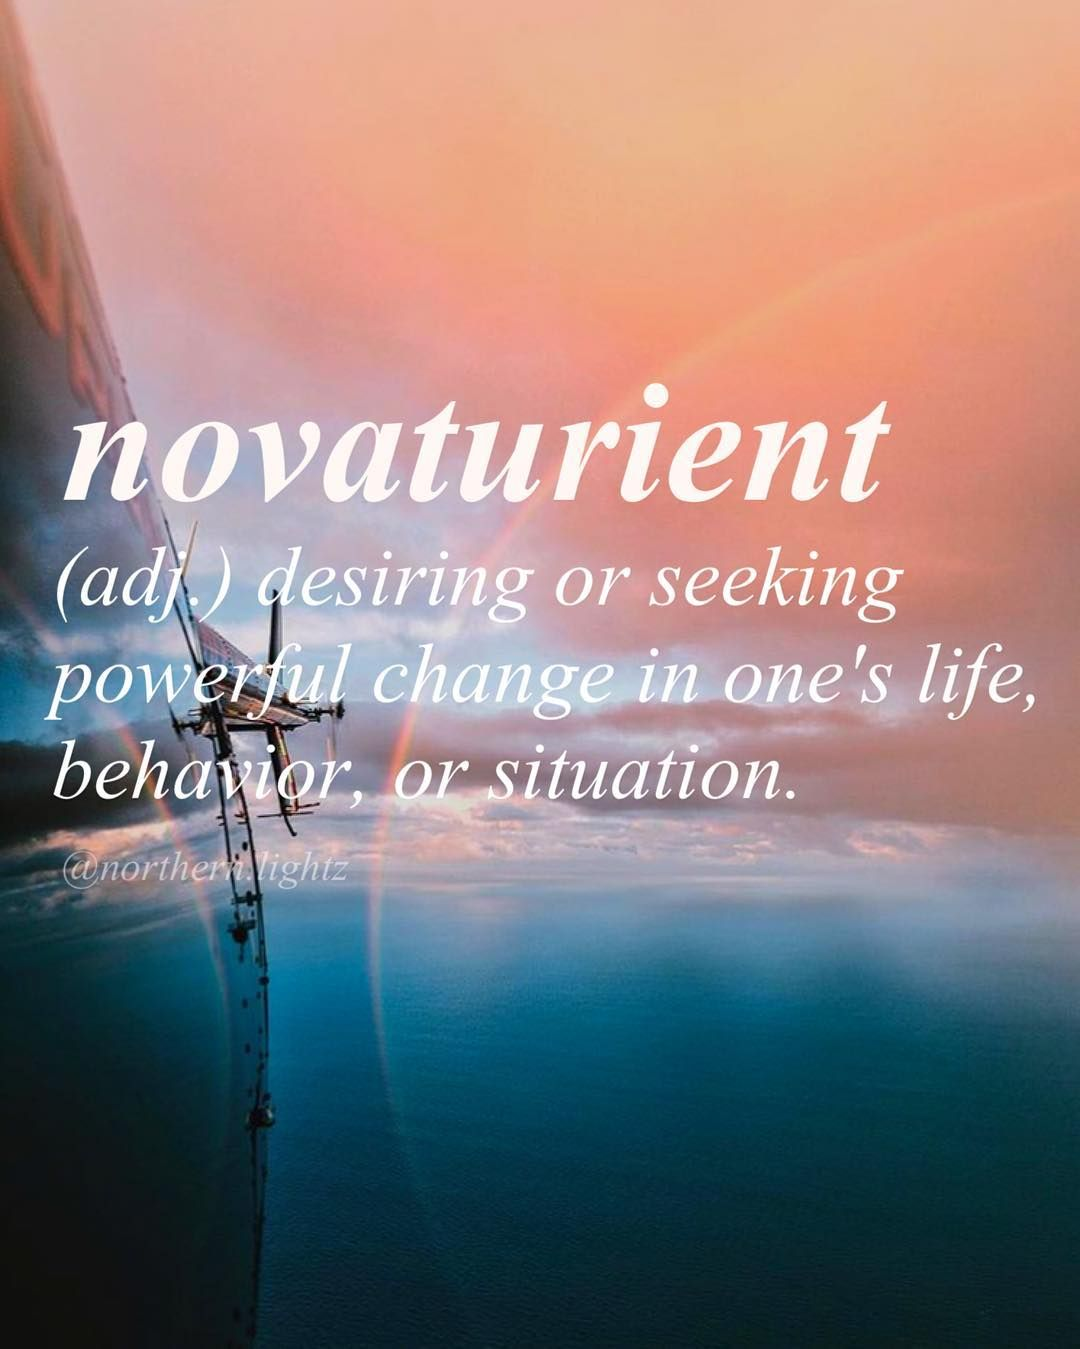 novatureent although this word has not yet been